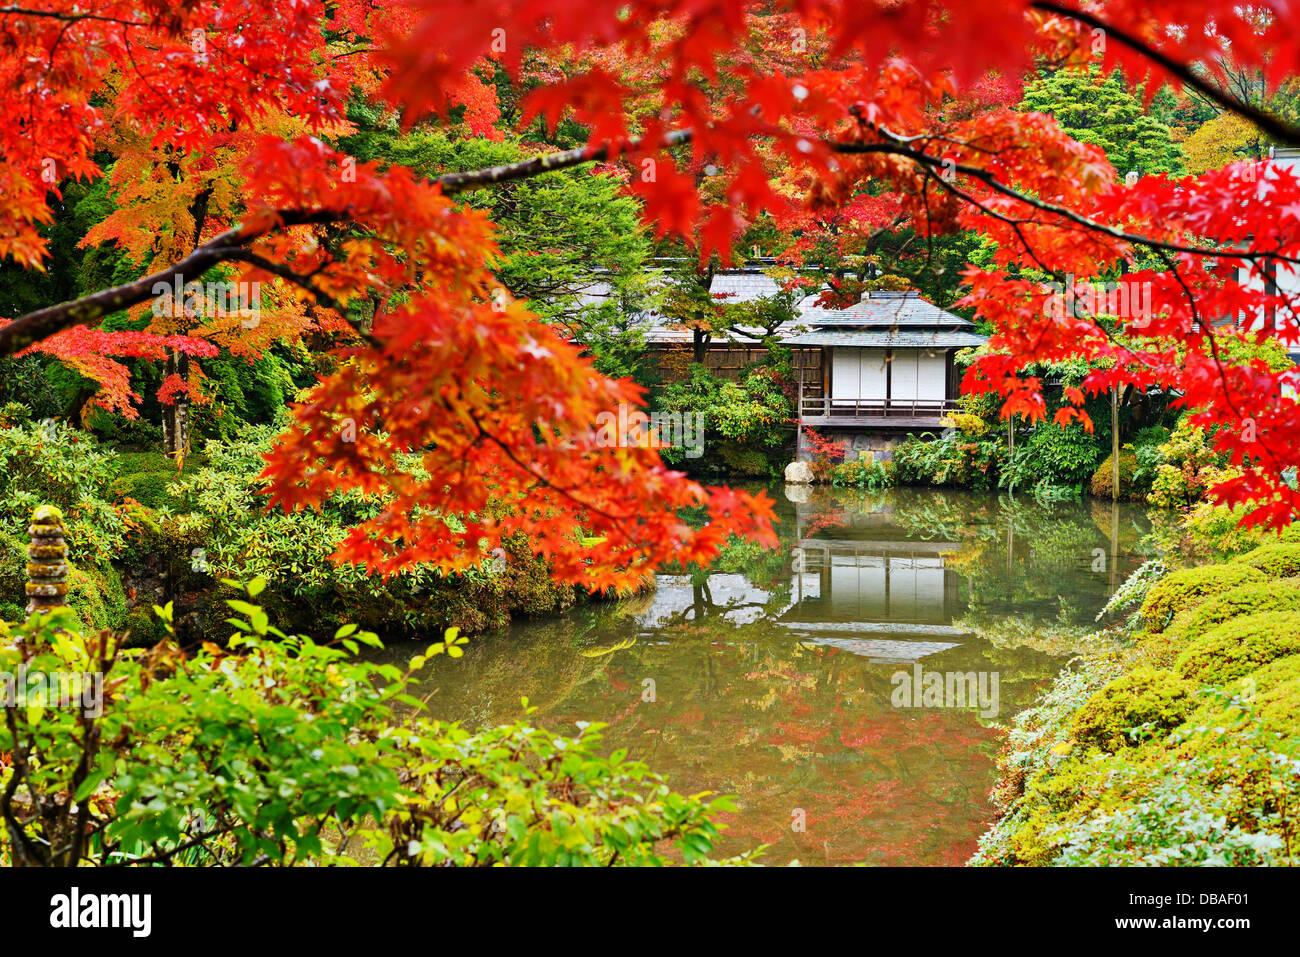 Jardín Japonés en Nikko, Japón. Imagen De Stock